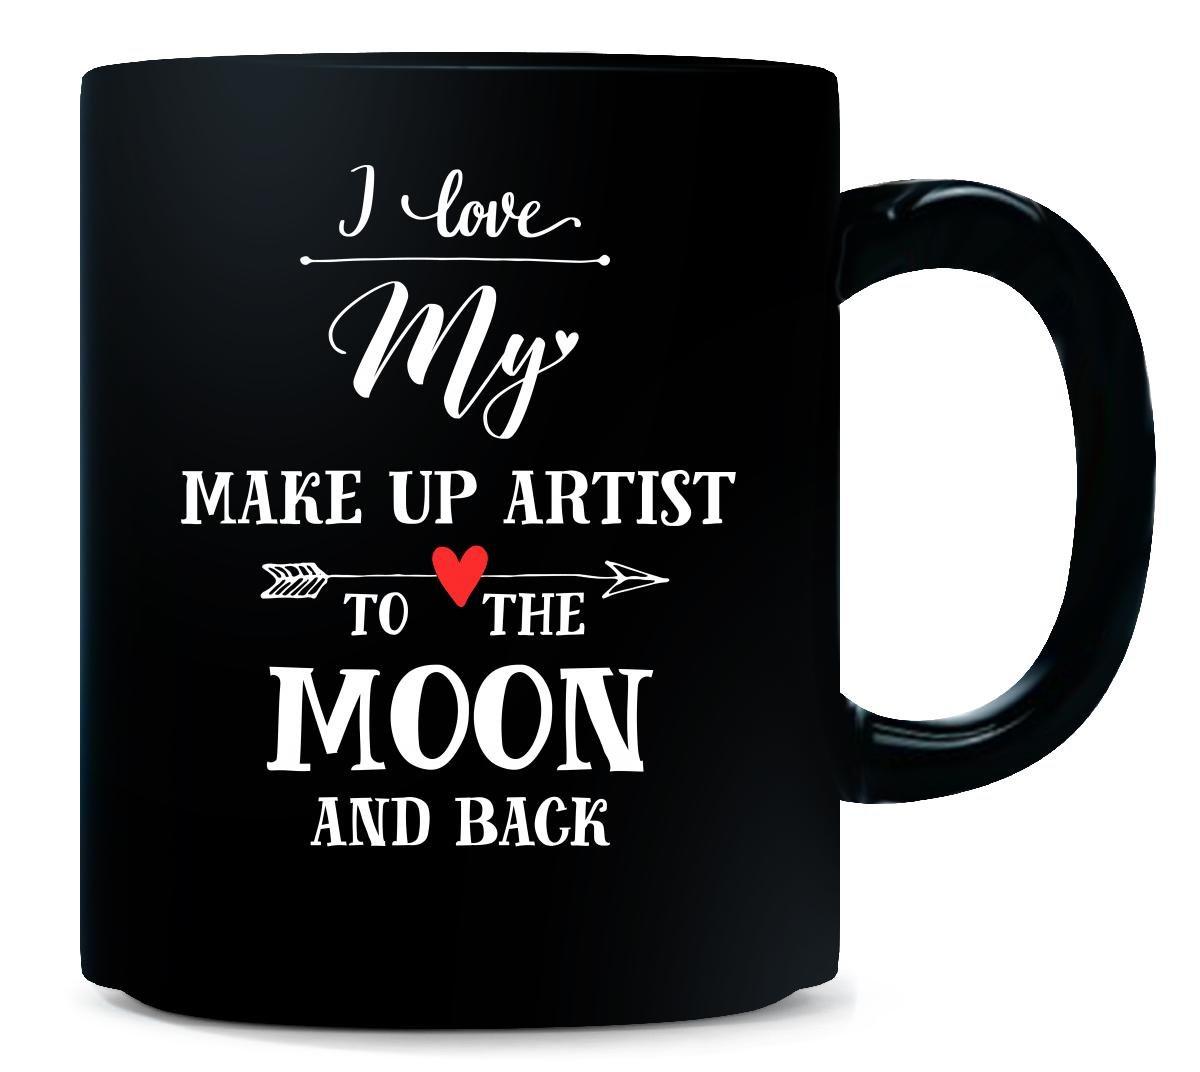 I Love My Make Up Artist To The Moon And Back Cool Gift - Mug